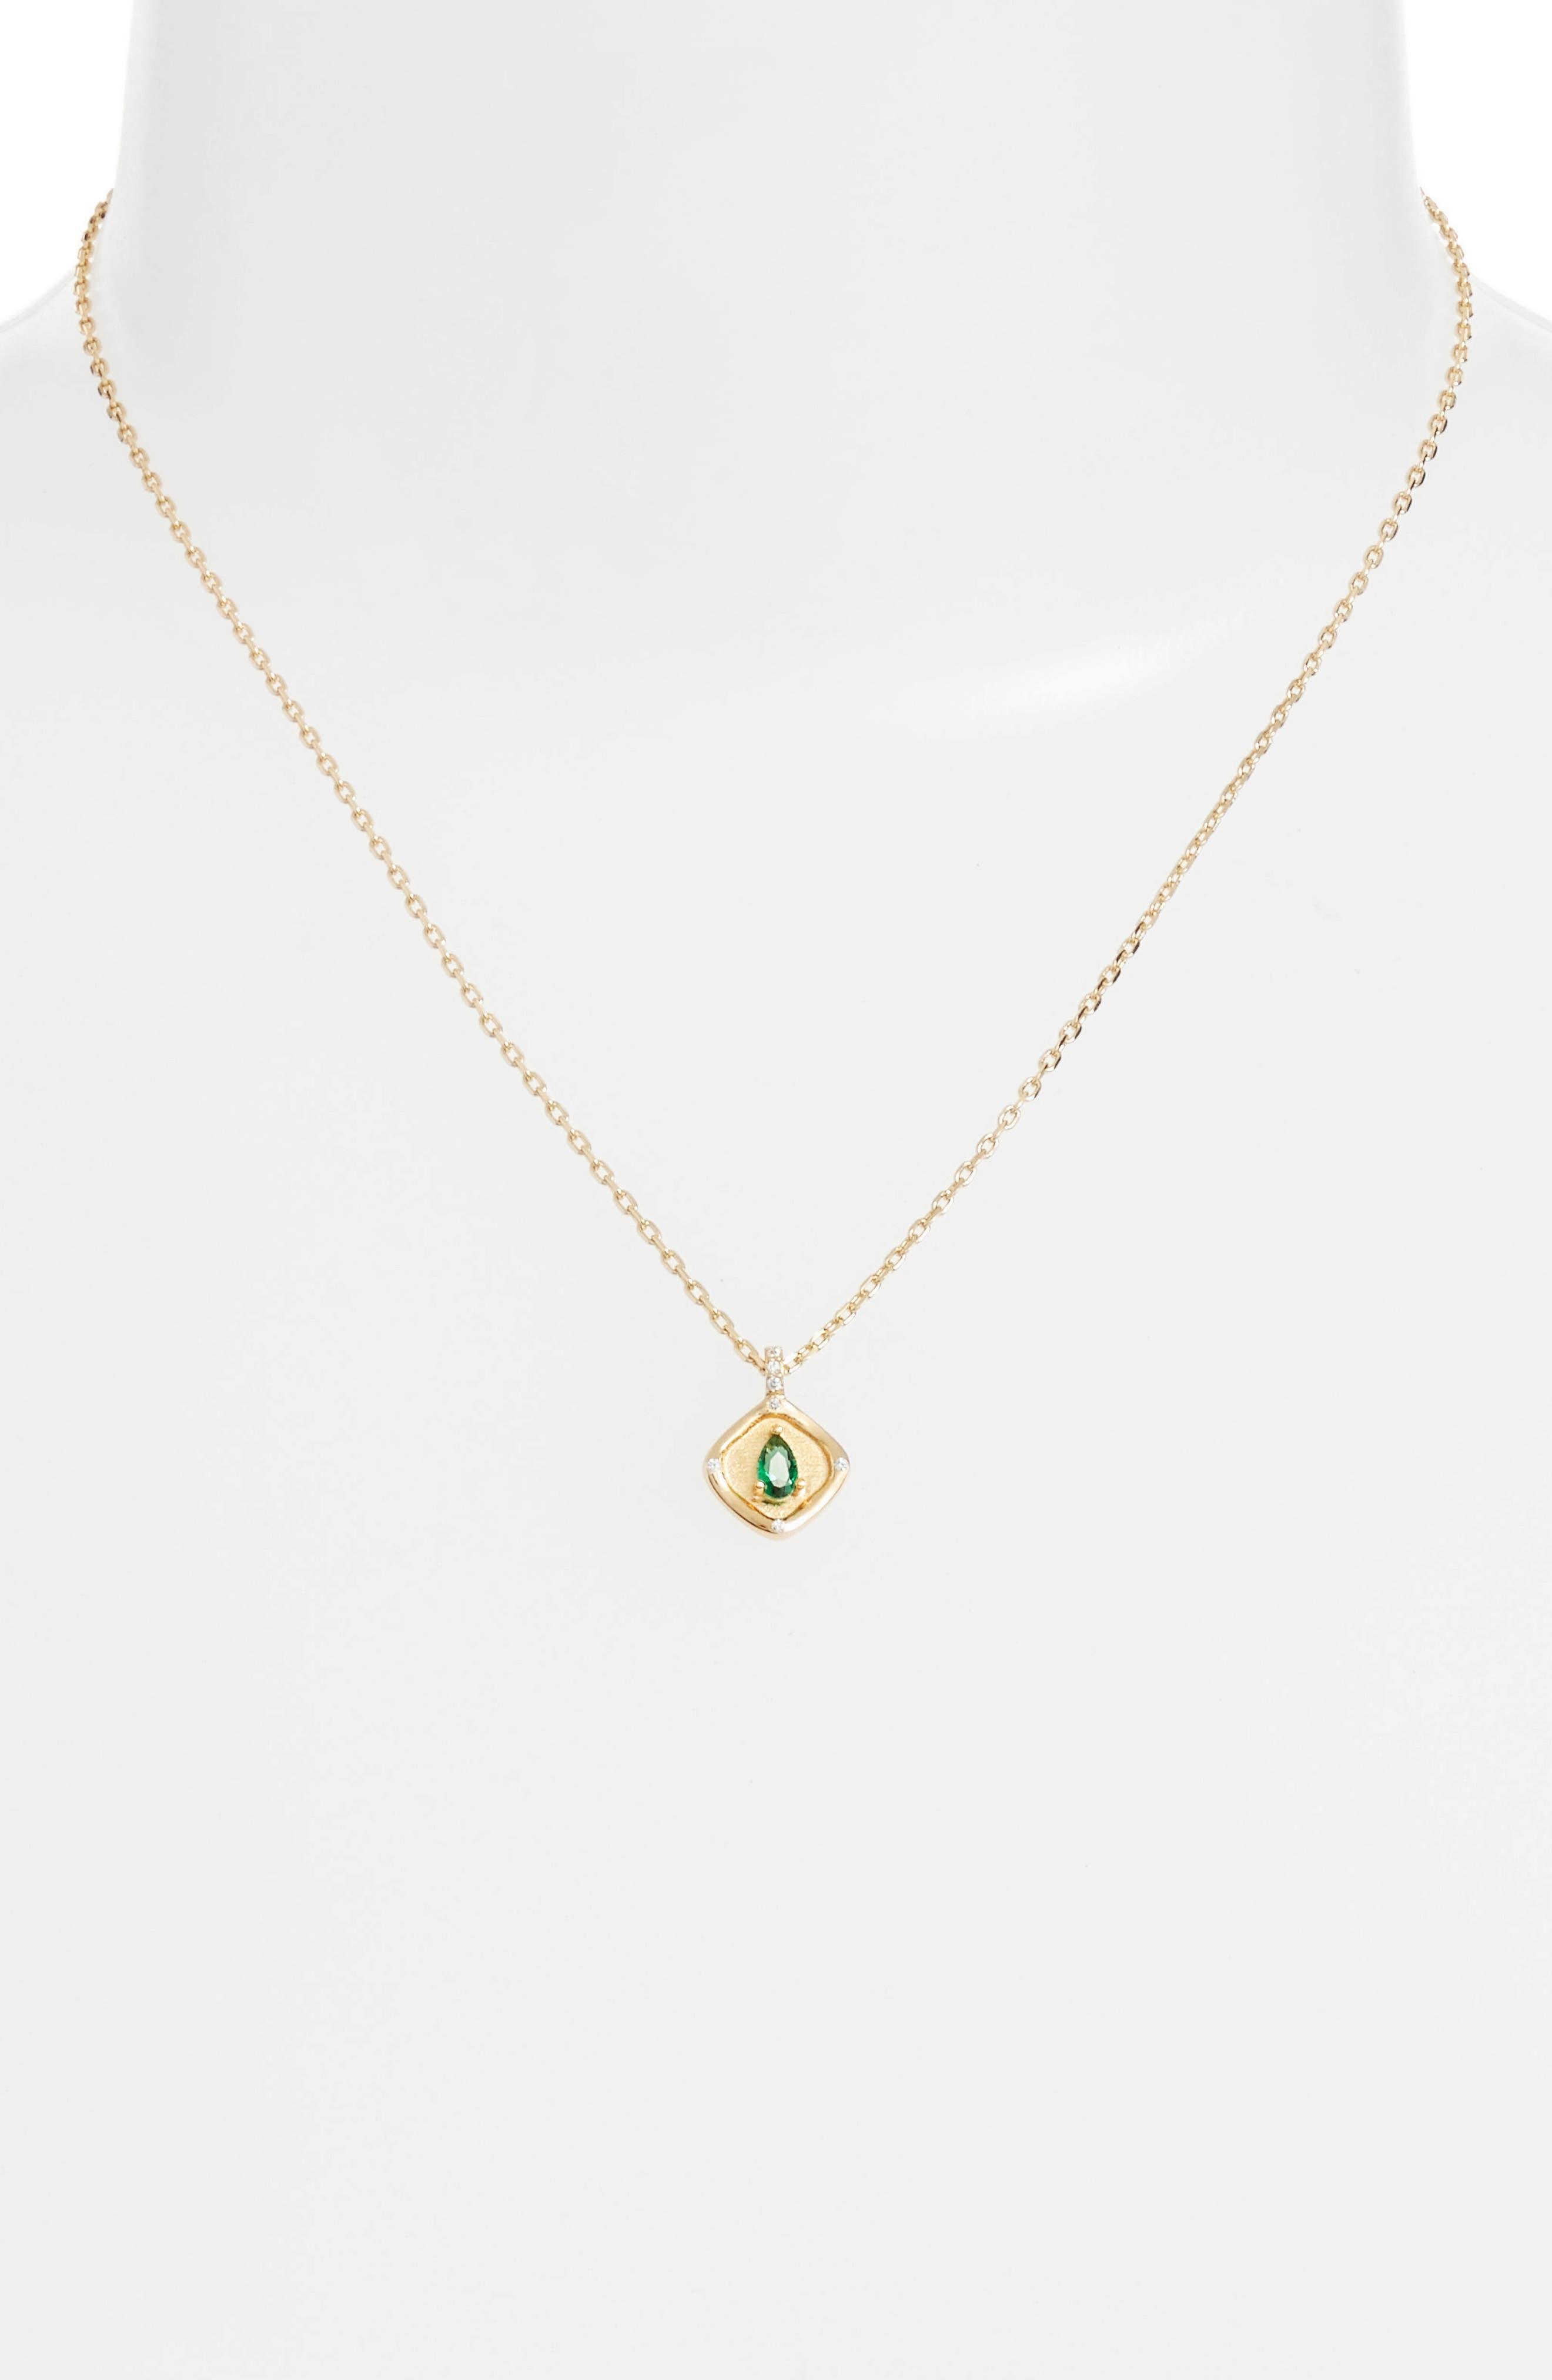 Teardrop Monthstone Pendant Necklace,                             Alternate thumbnail 2, color,                             300